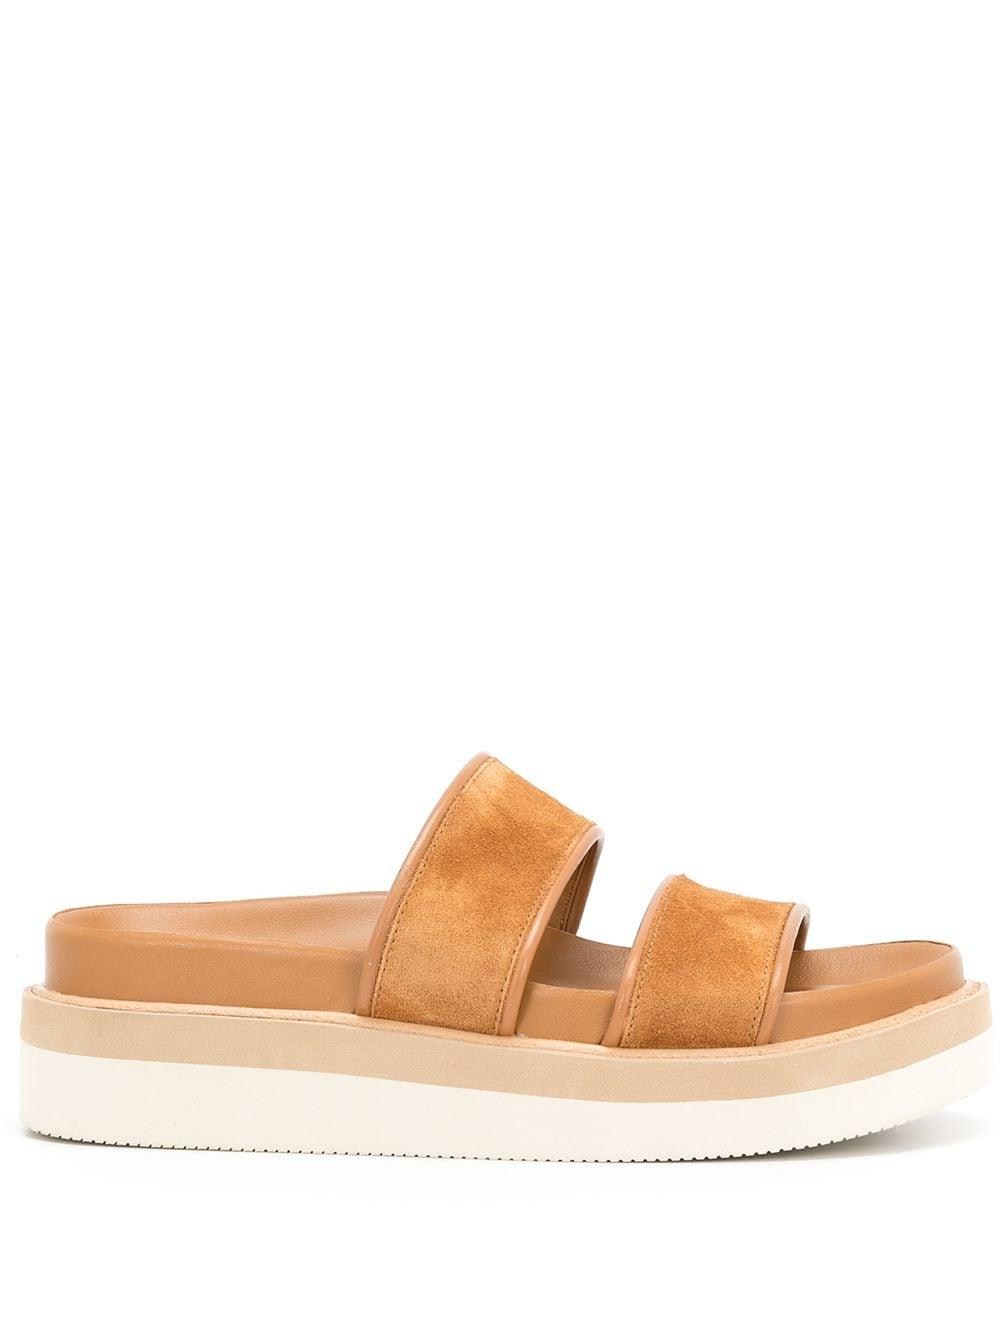 Coco Sport Suede Sandal